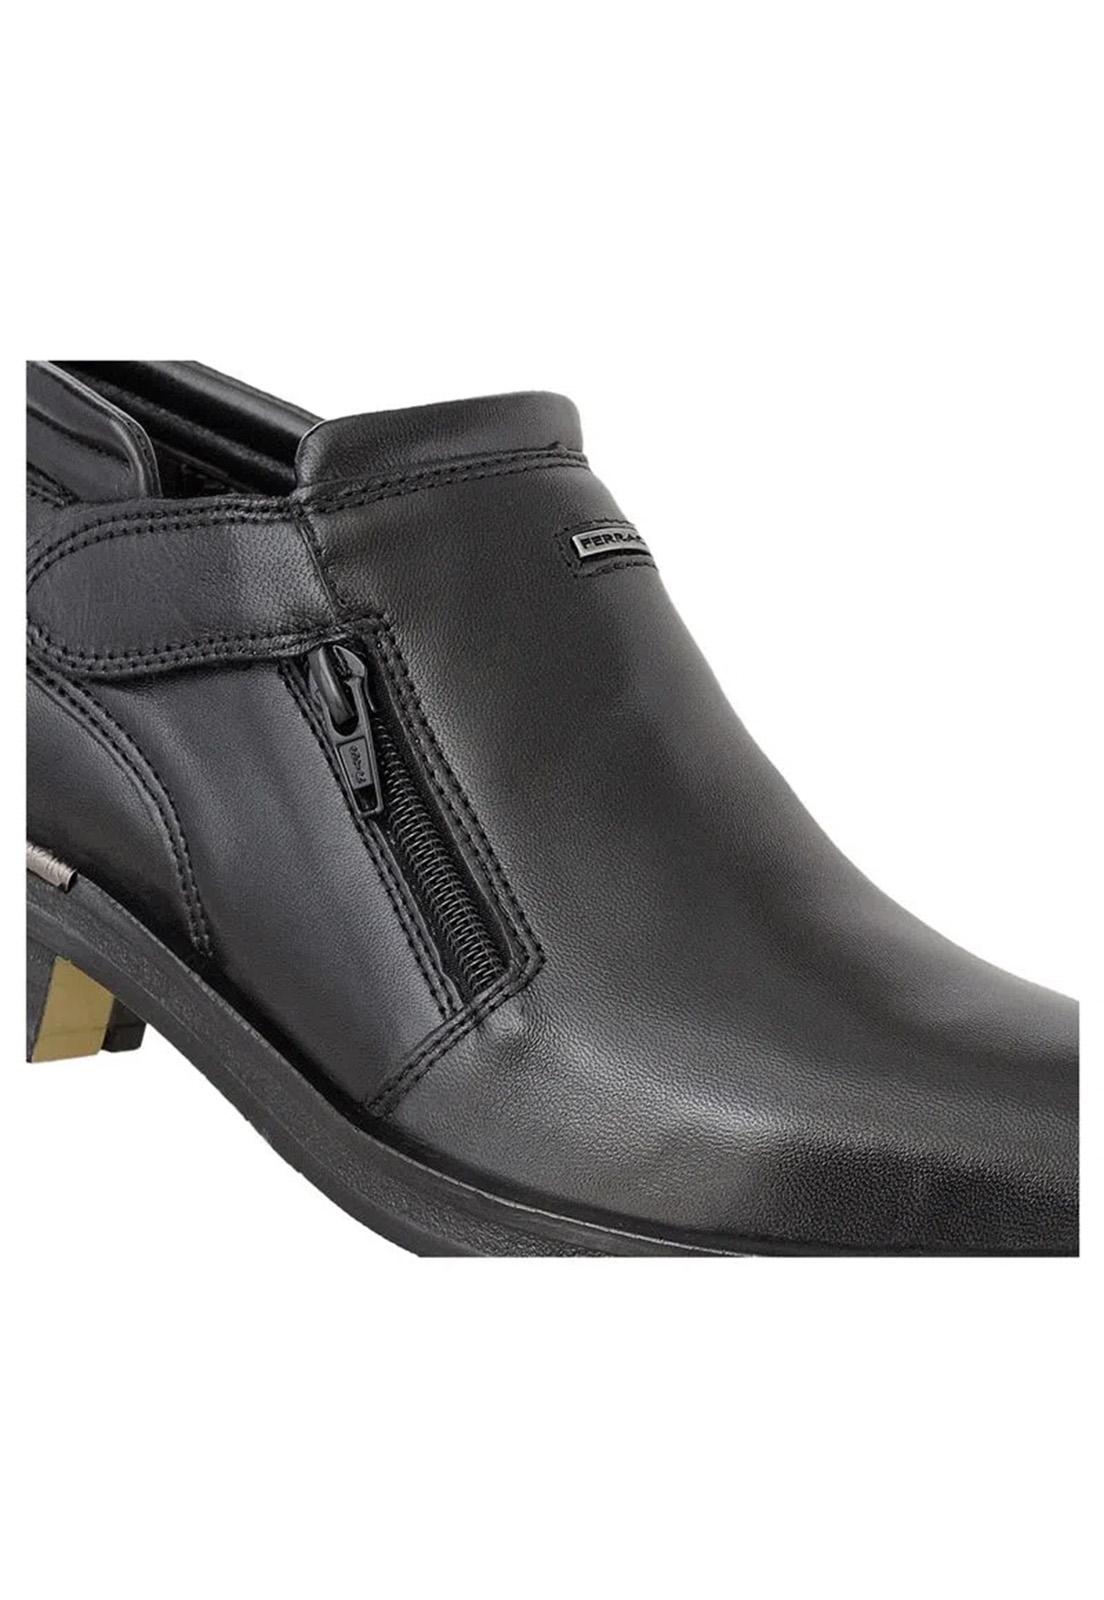 Sapato Ferracini Urban Way 6622-106A